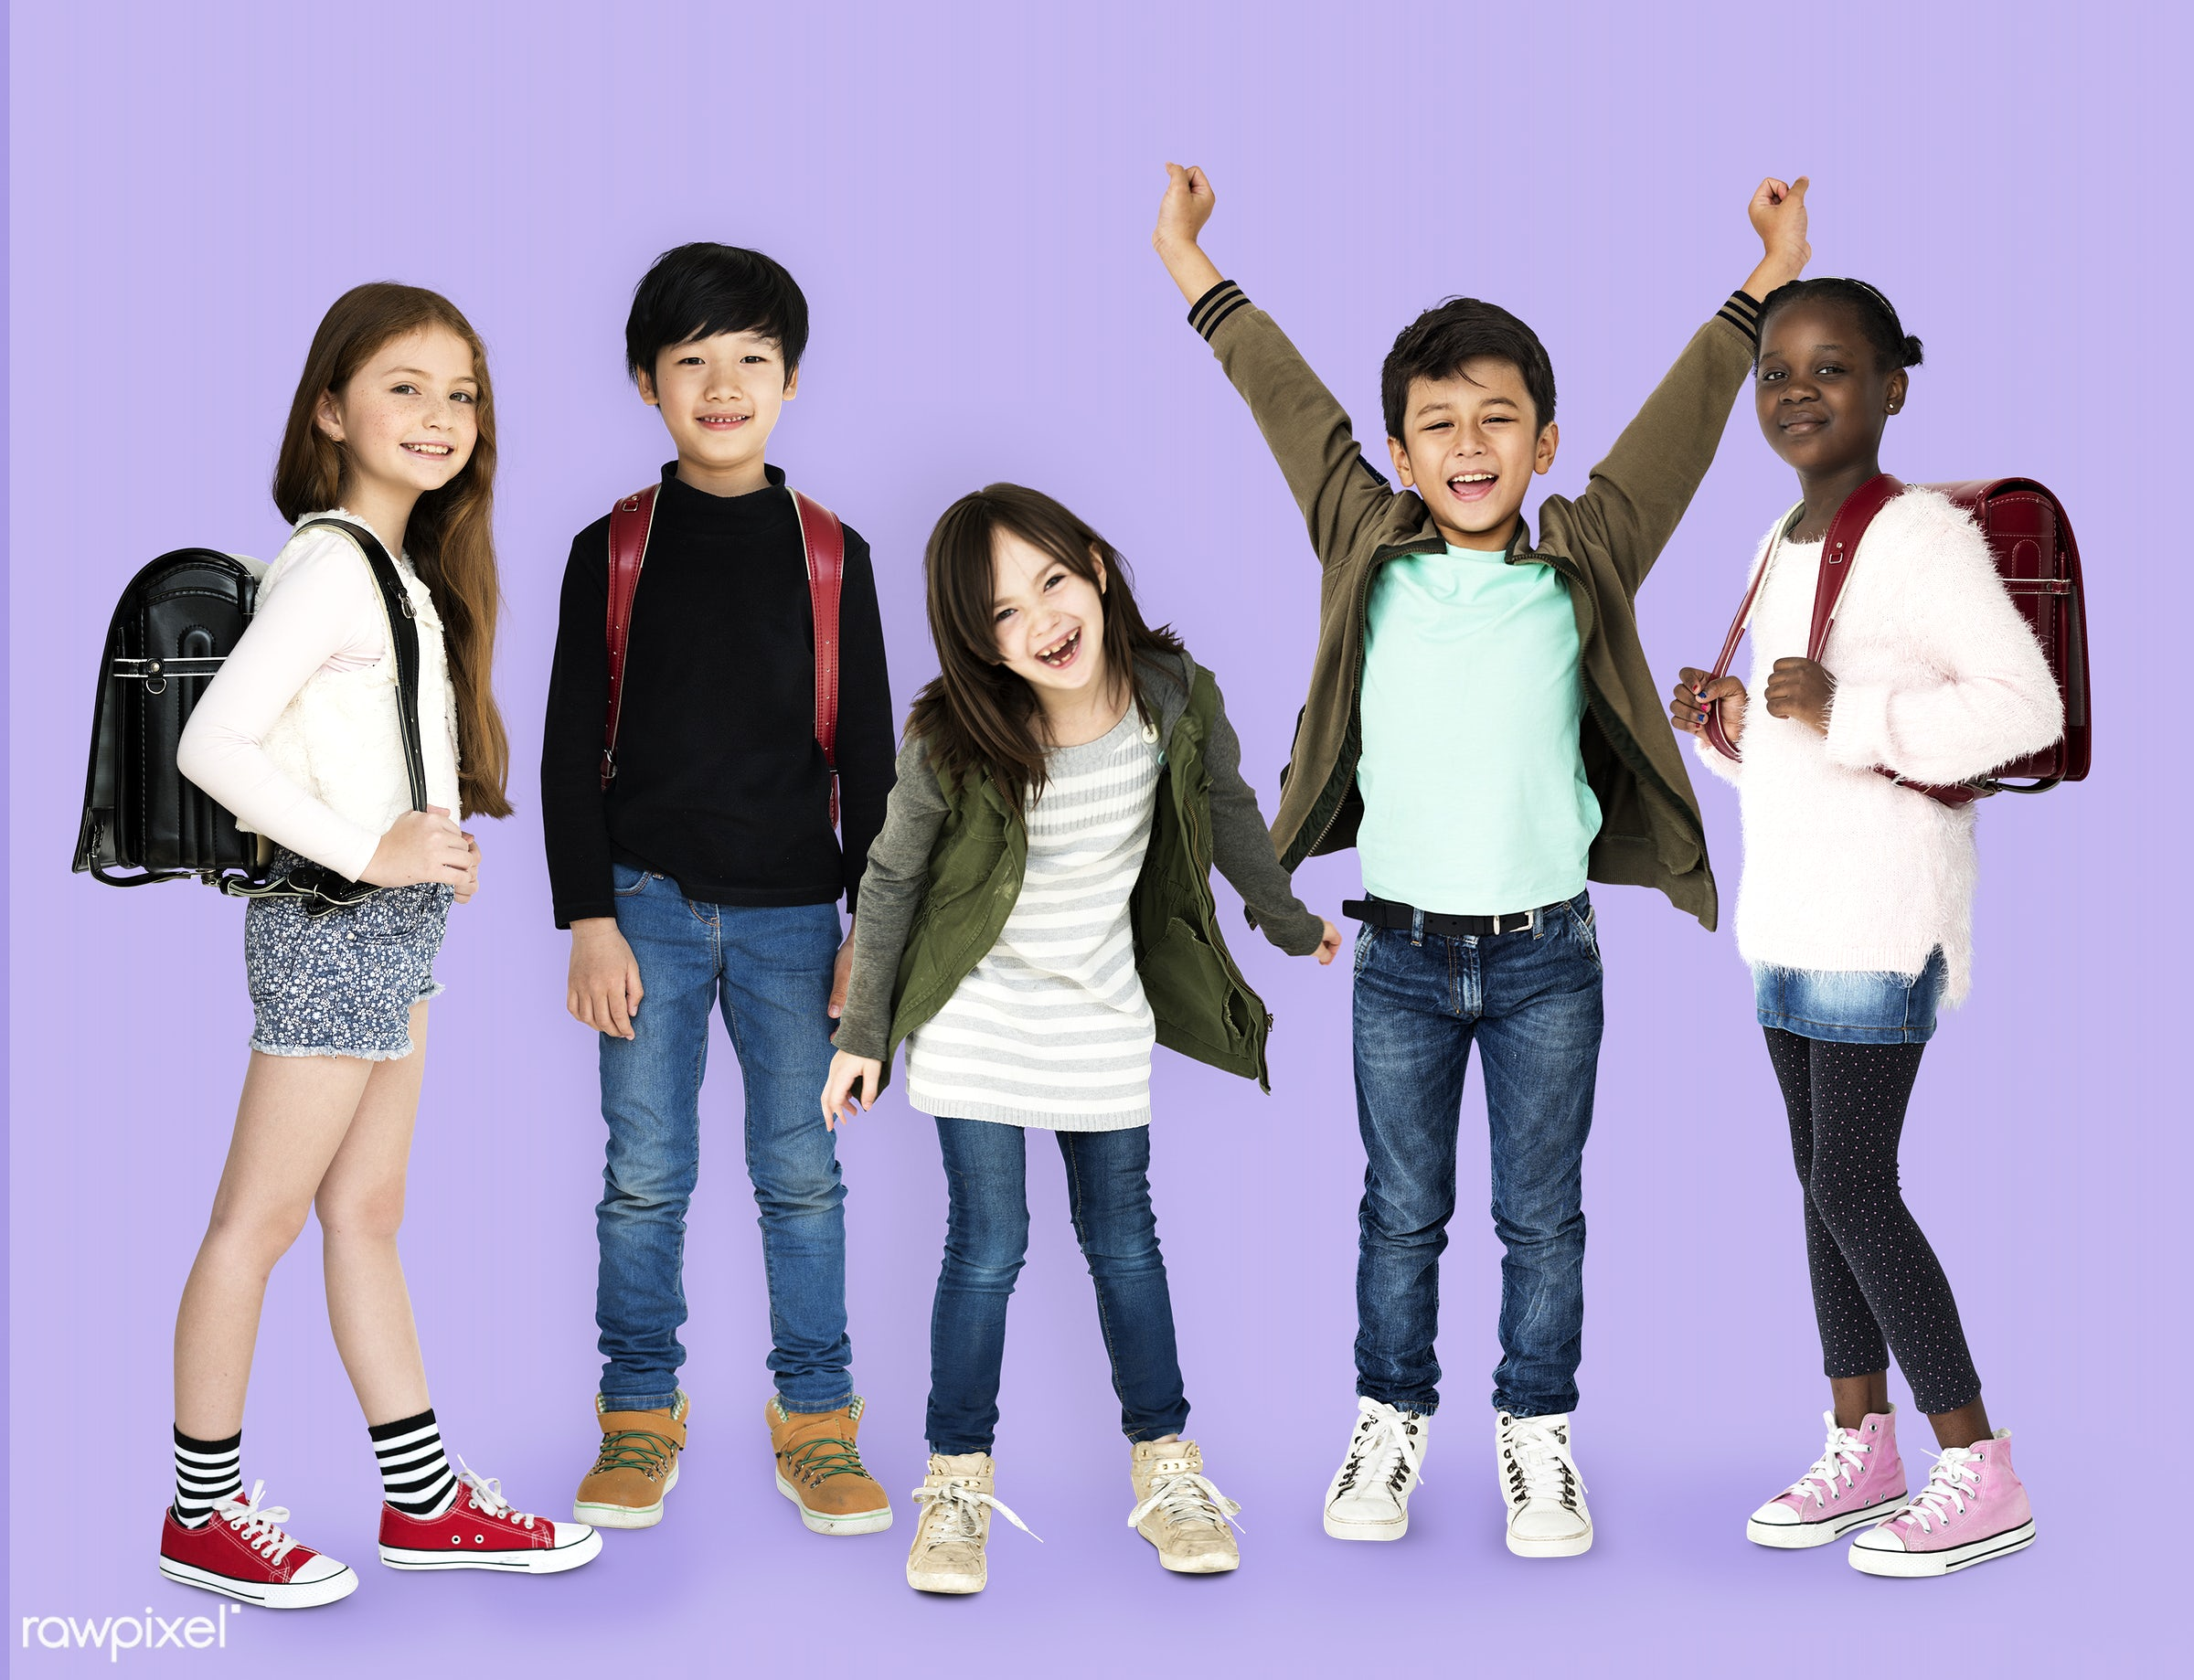 studio, person, diverse, innocent, little, entertain, recreation, people, asian, caucasian, little girls, student, lifestyle...